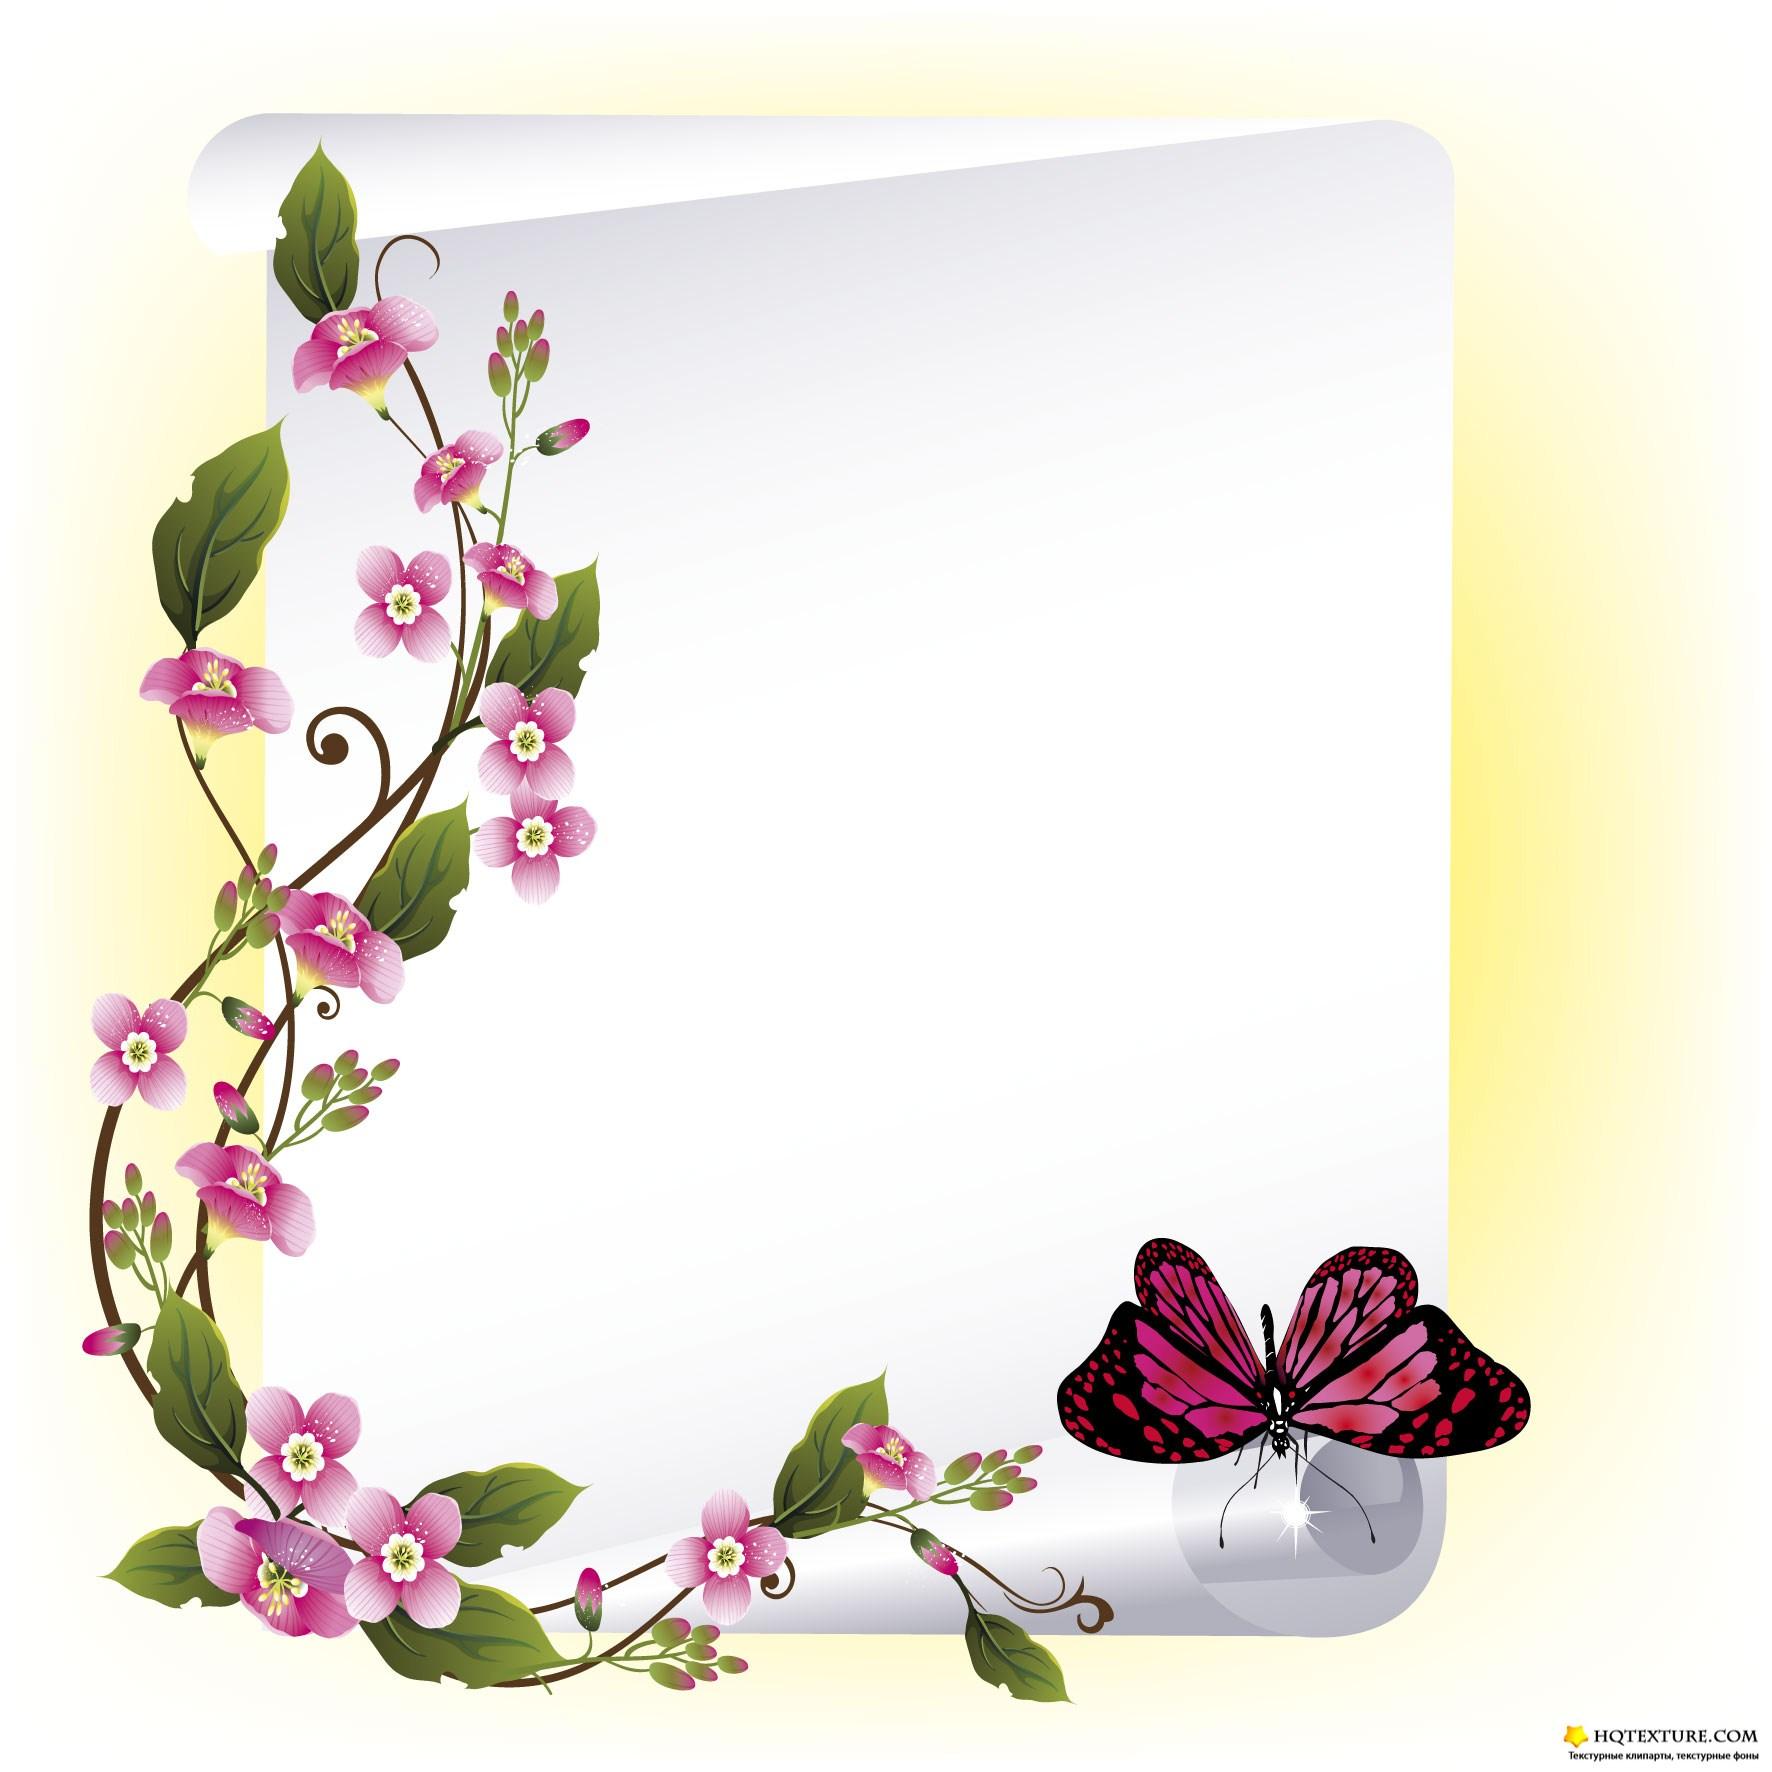 Картинки рамки для цветы